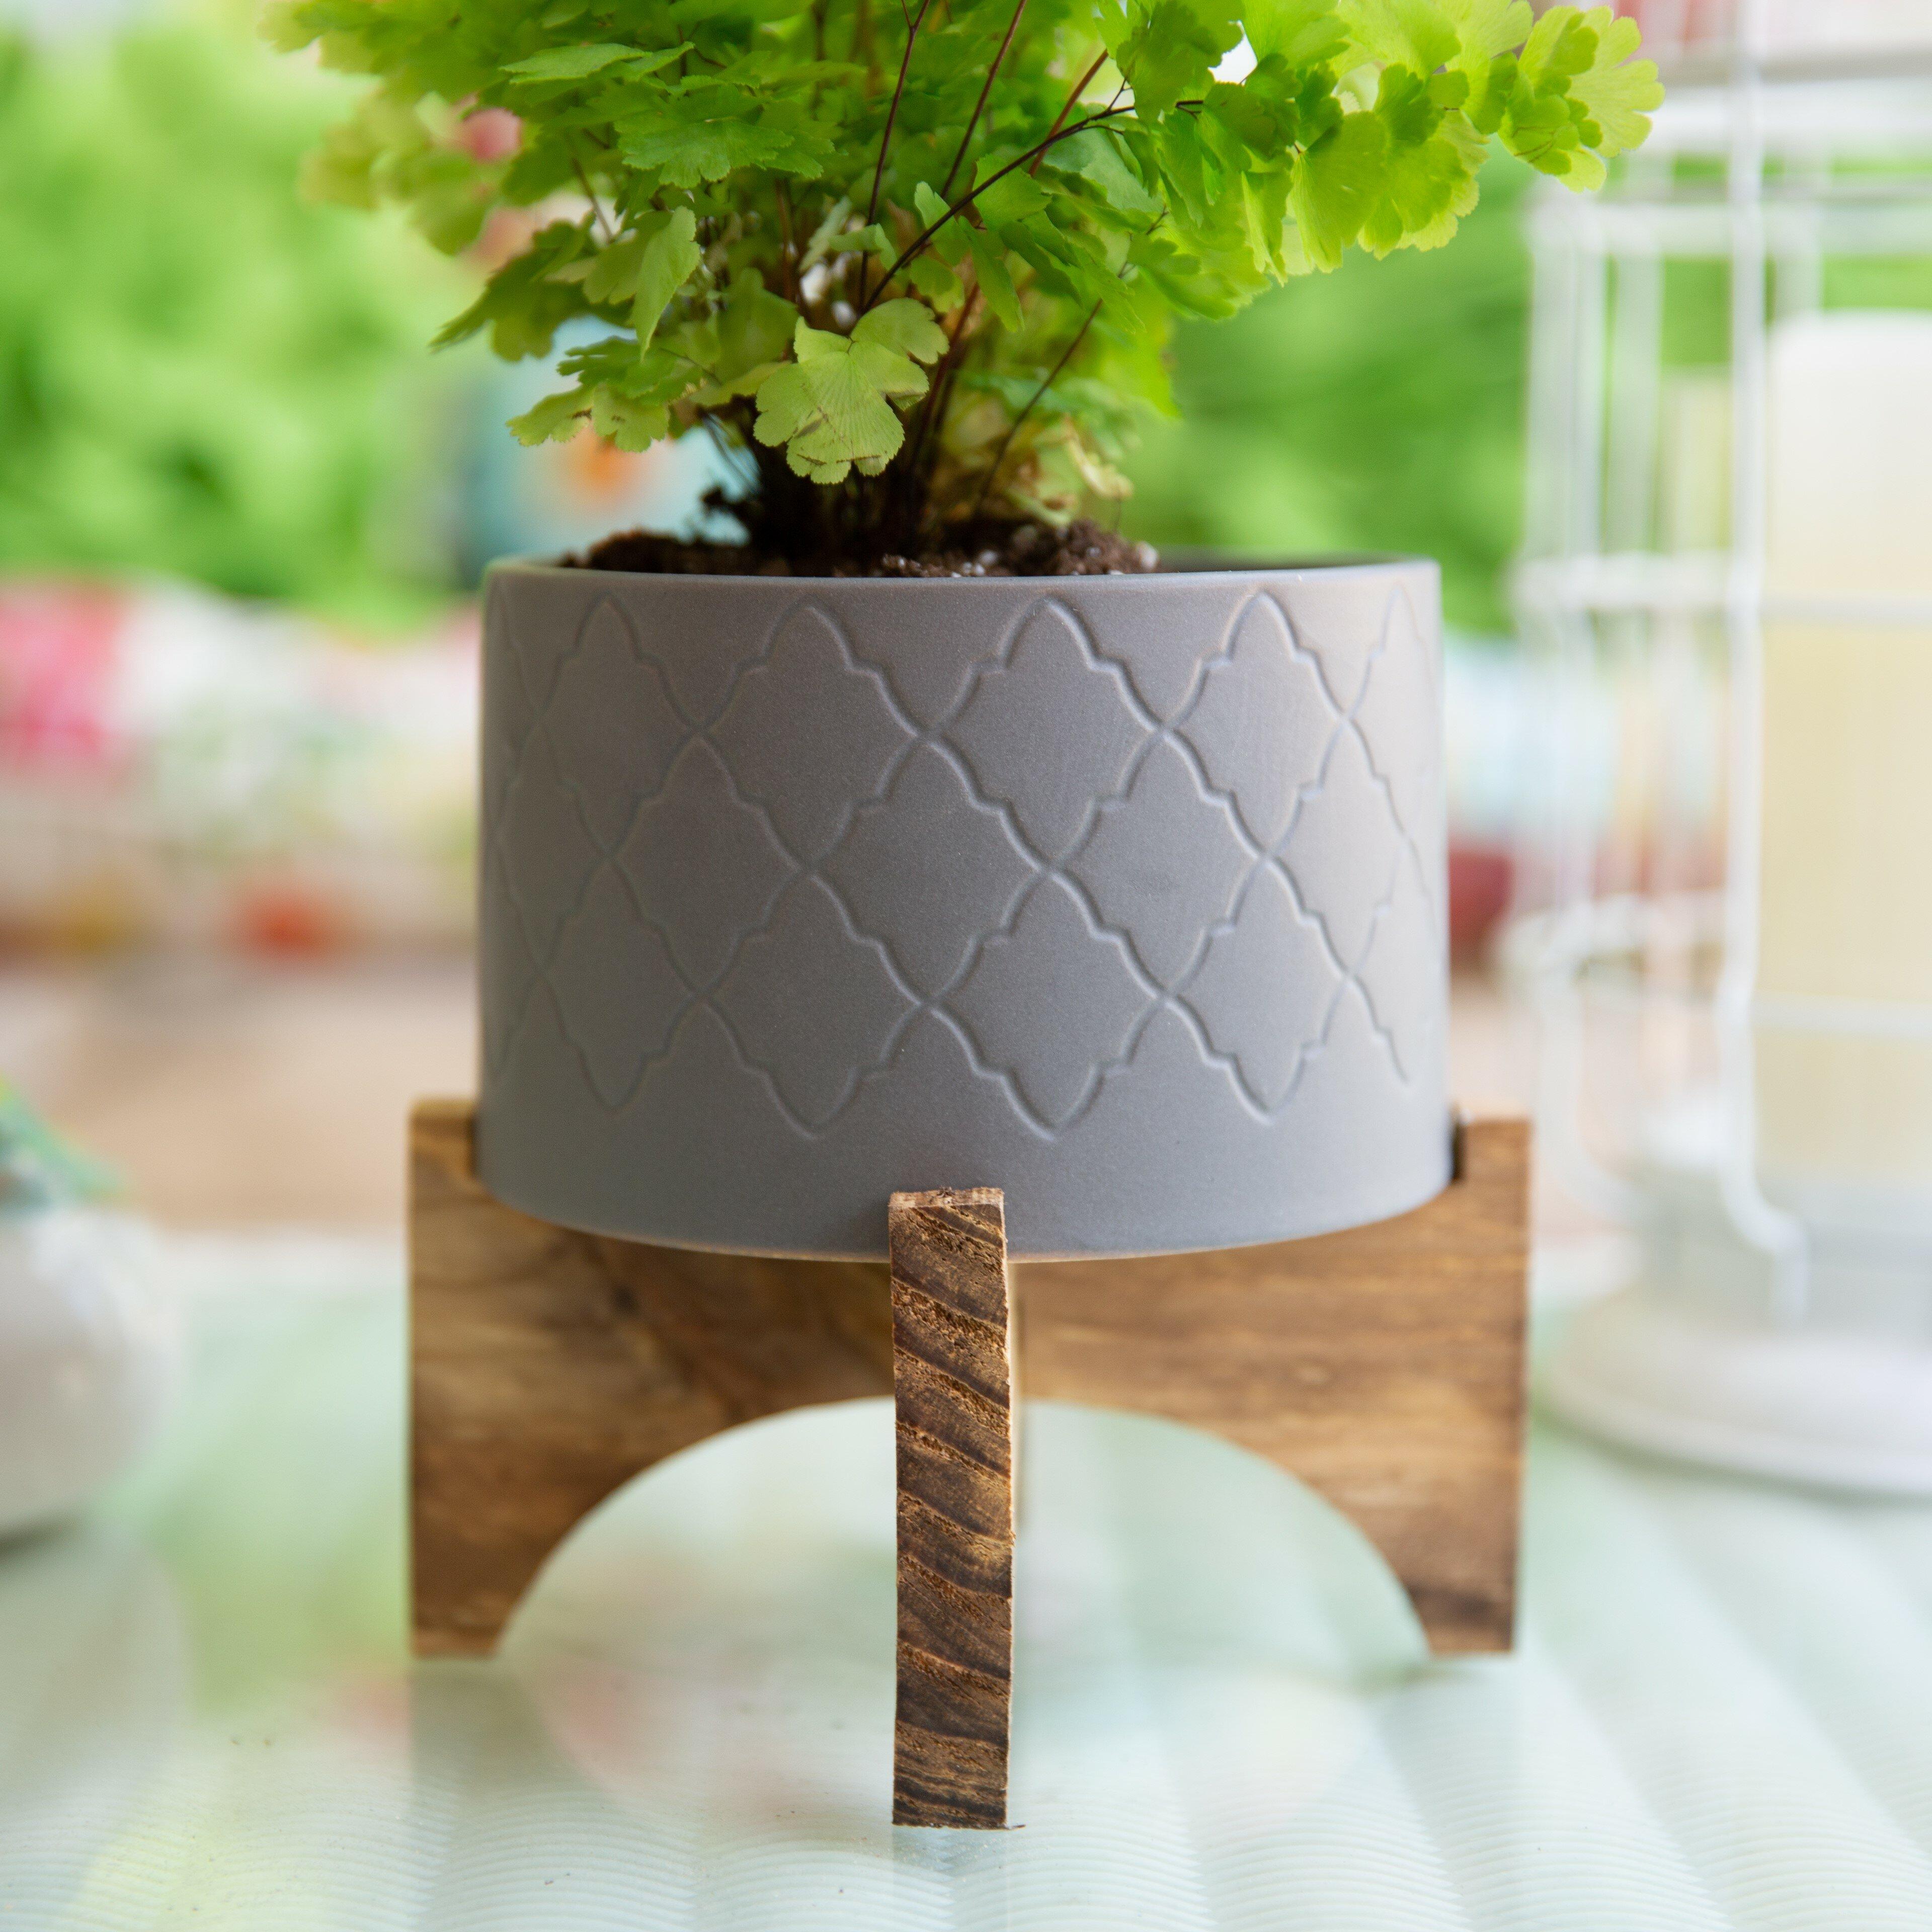 Williston Forge Bohn Ceramic Pot Planter Reviews Wayfair